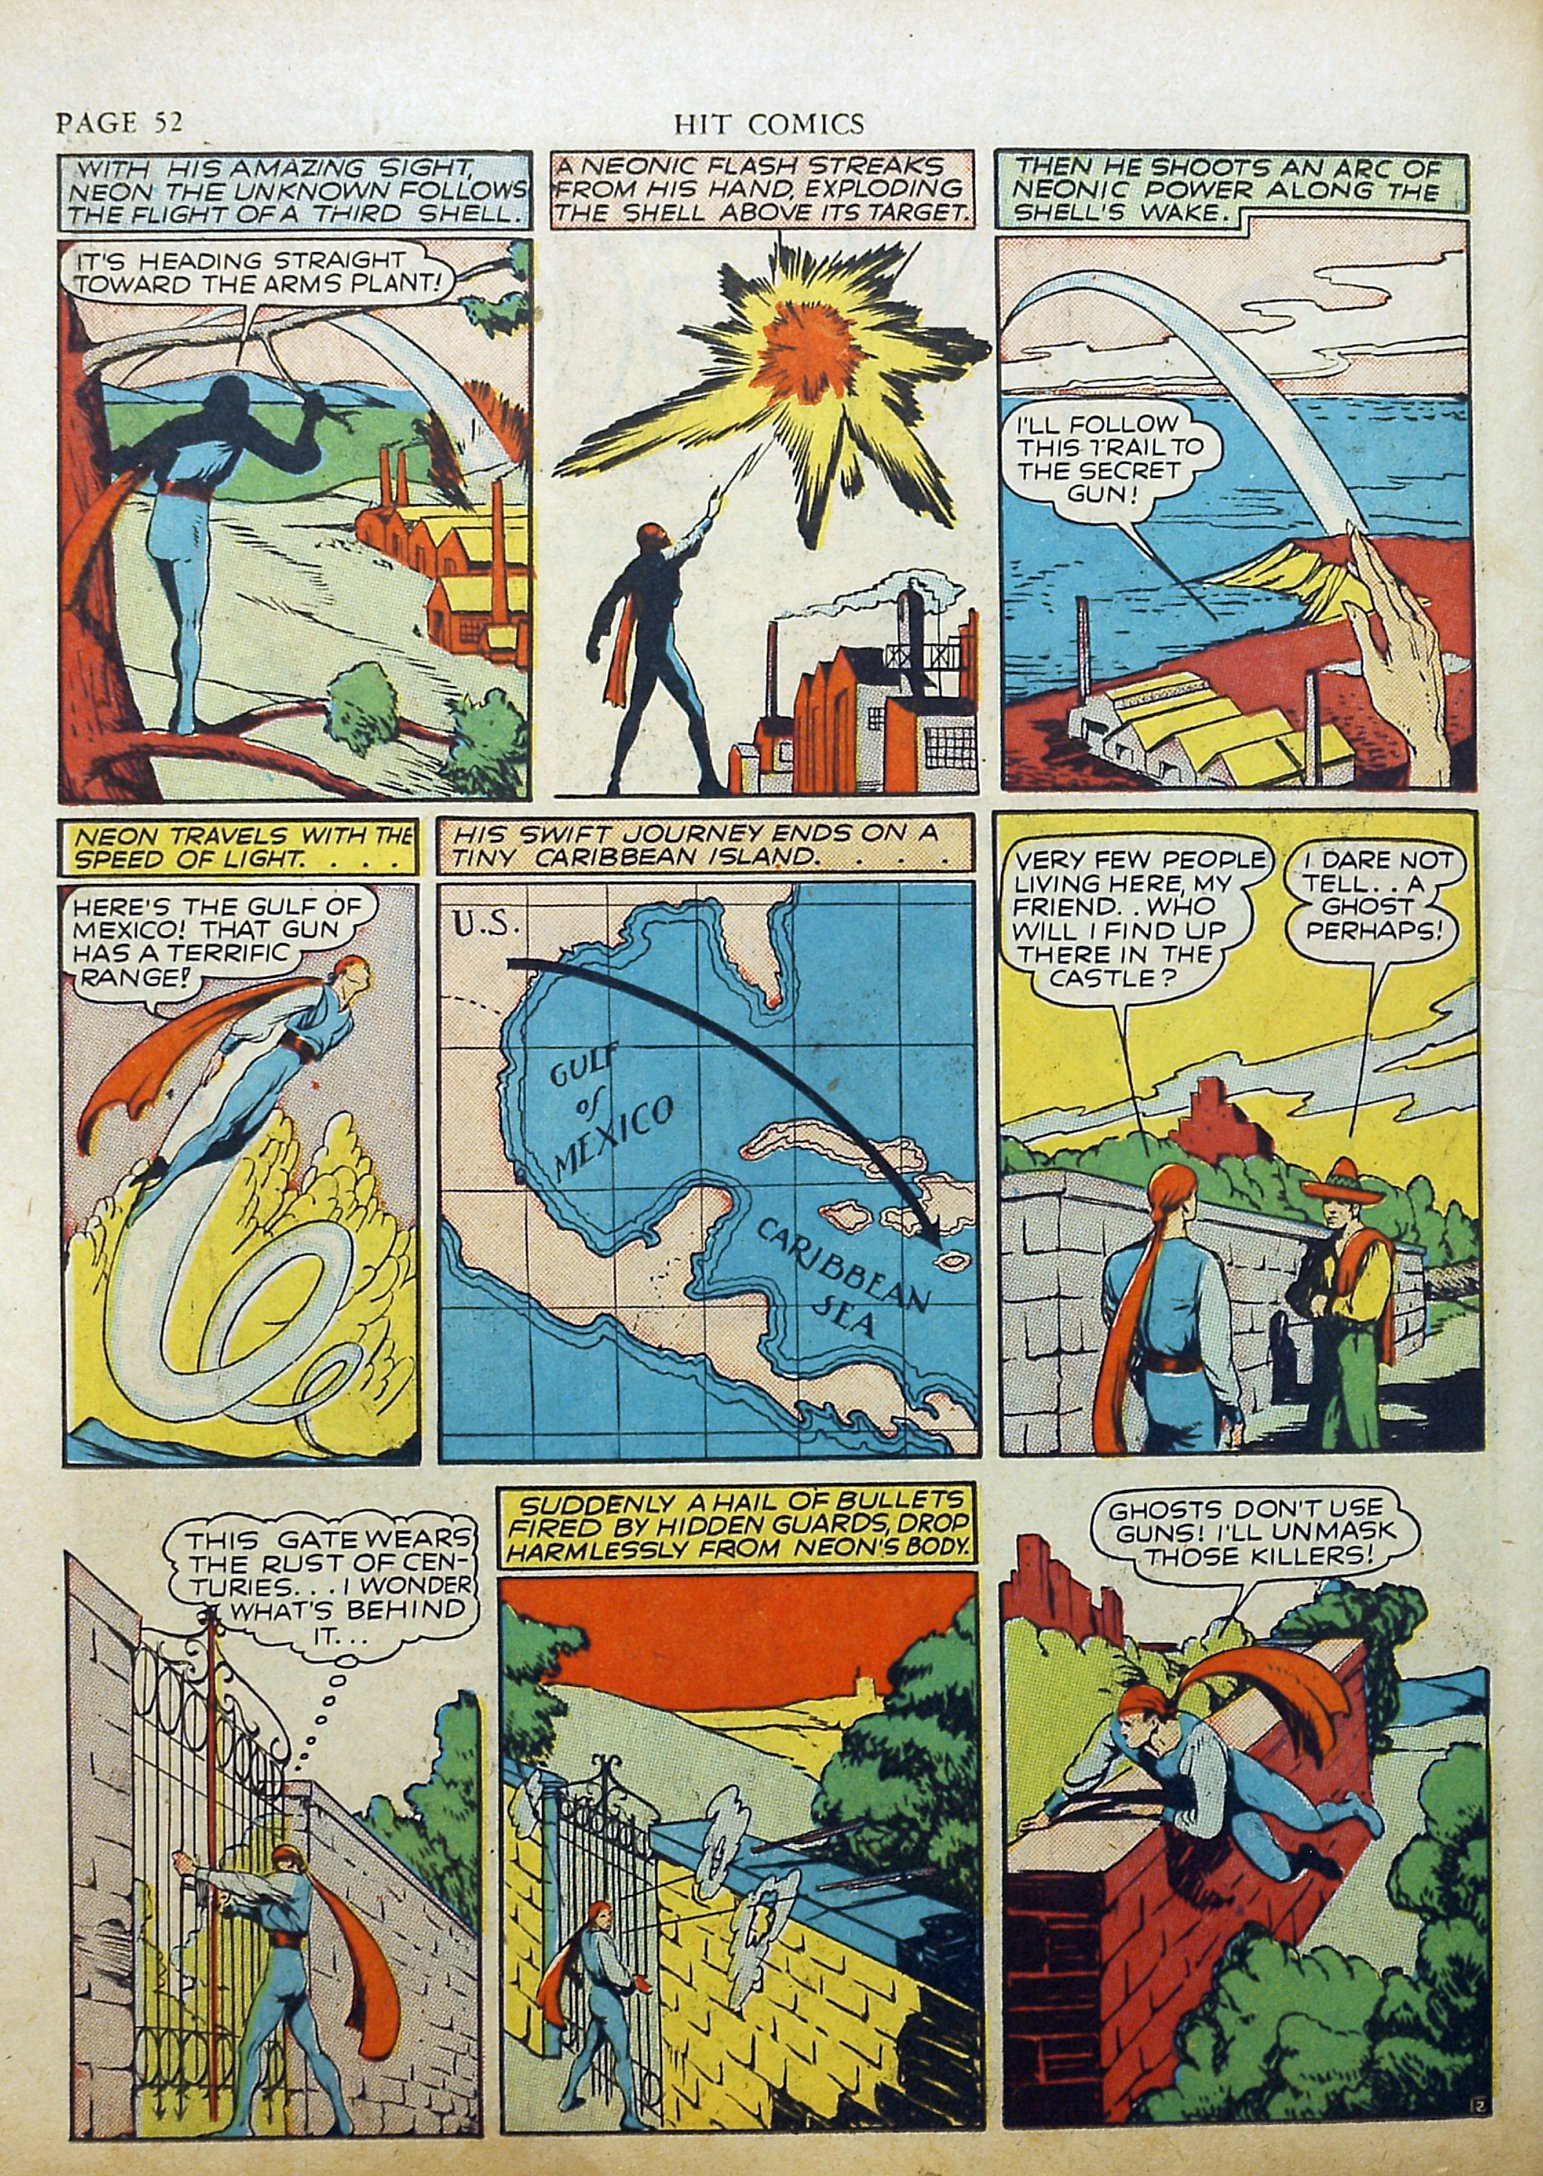 Read online Hit Comics comic -  Issue #17 - 54